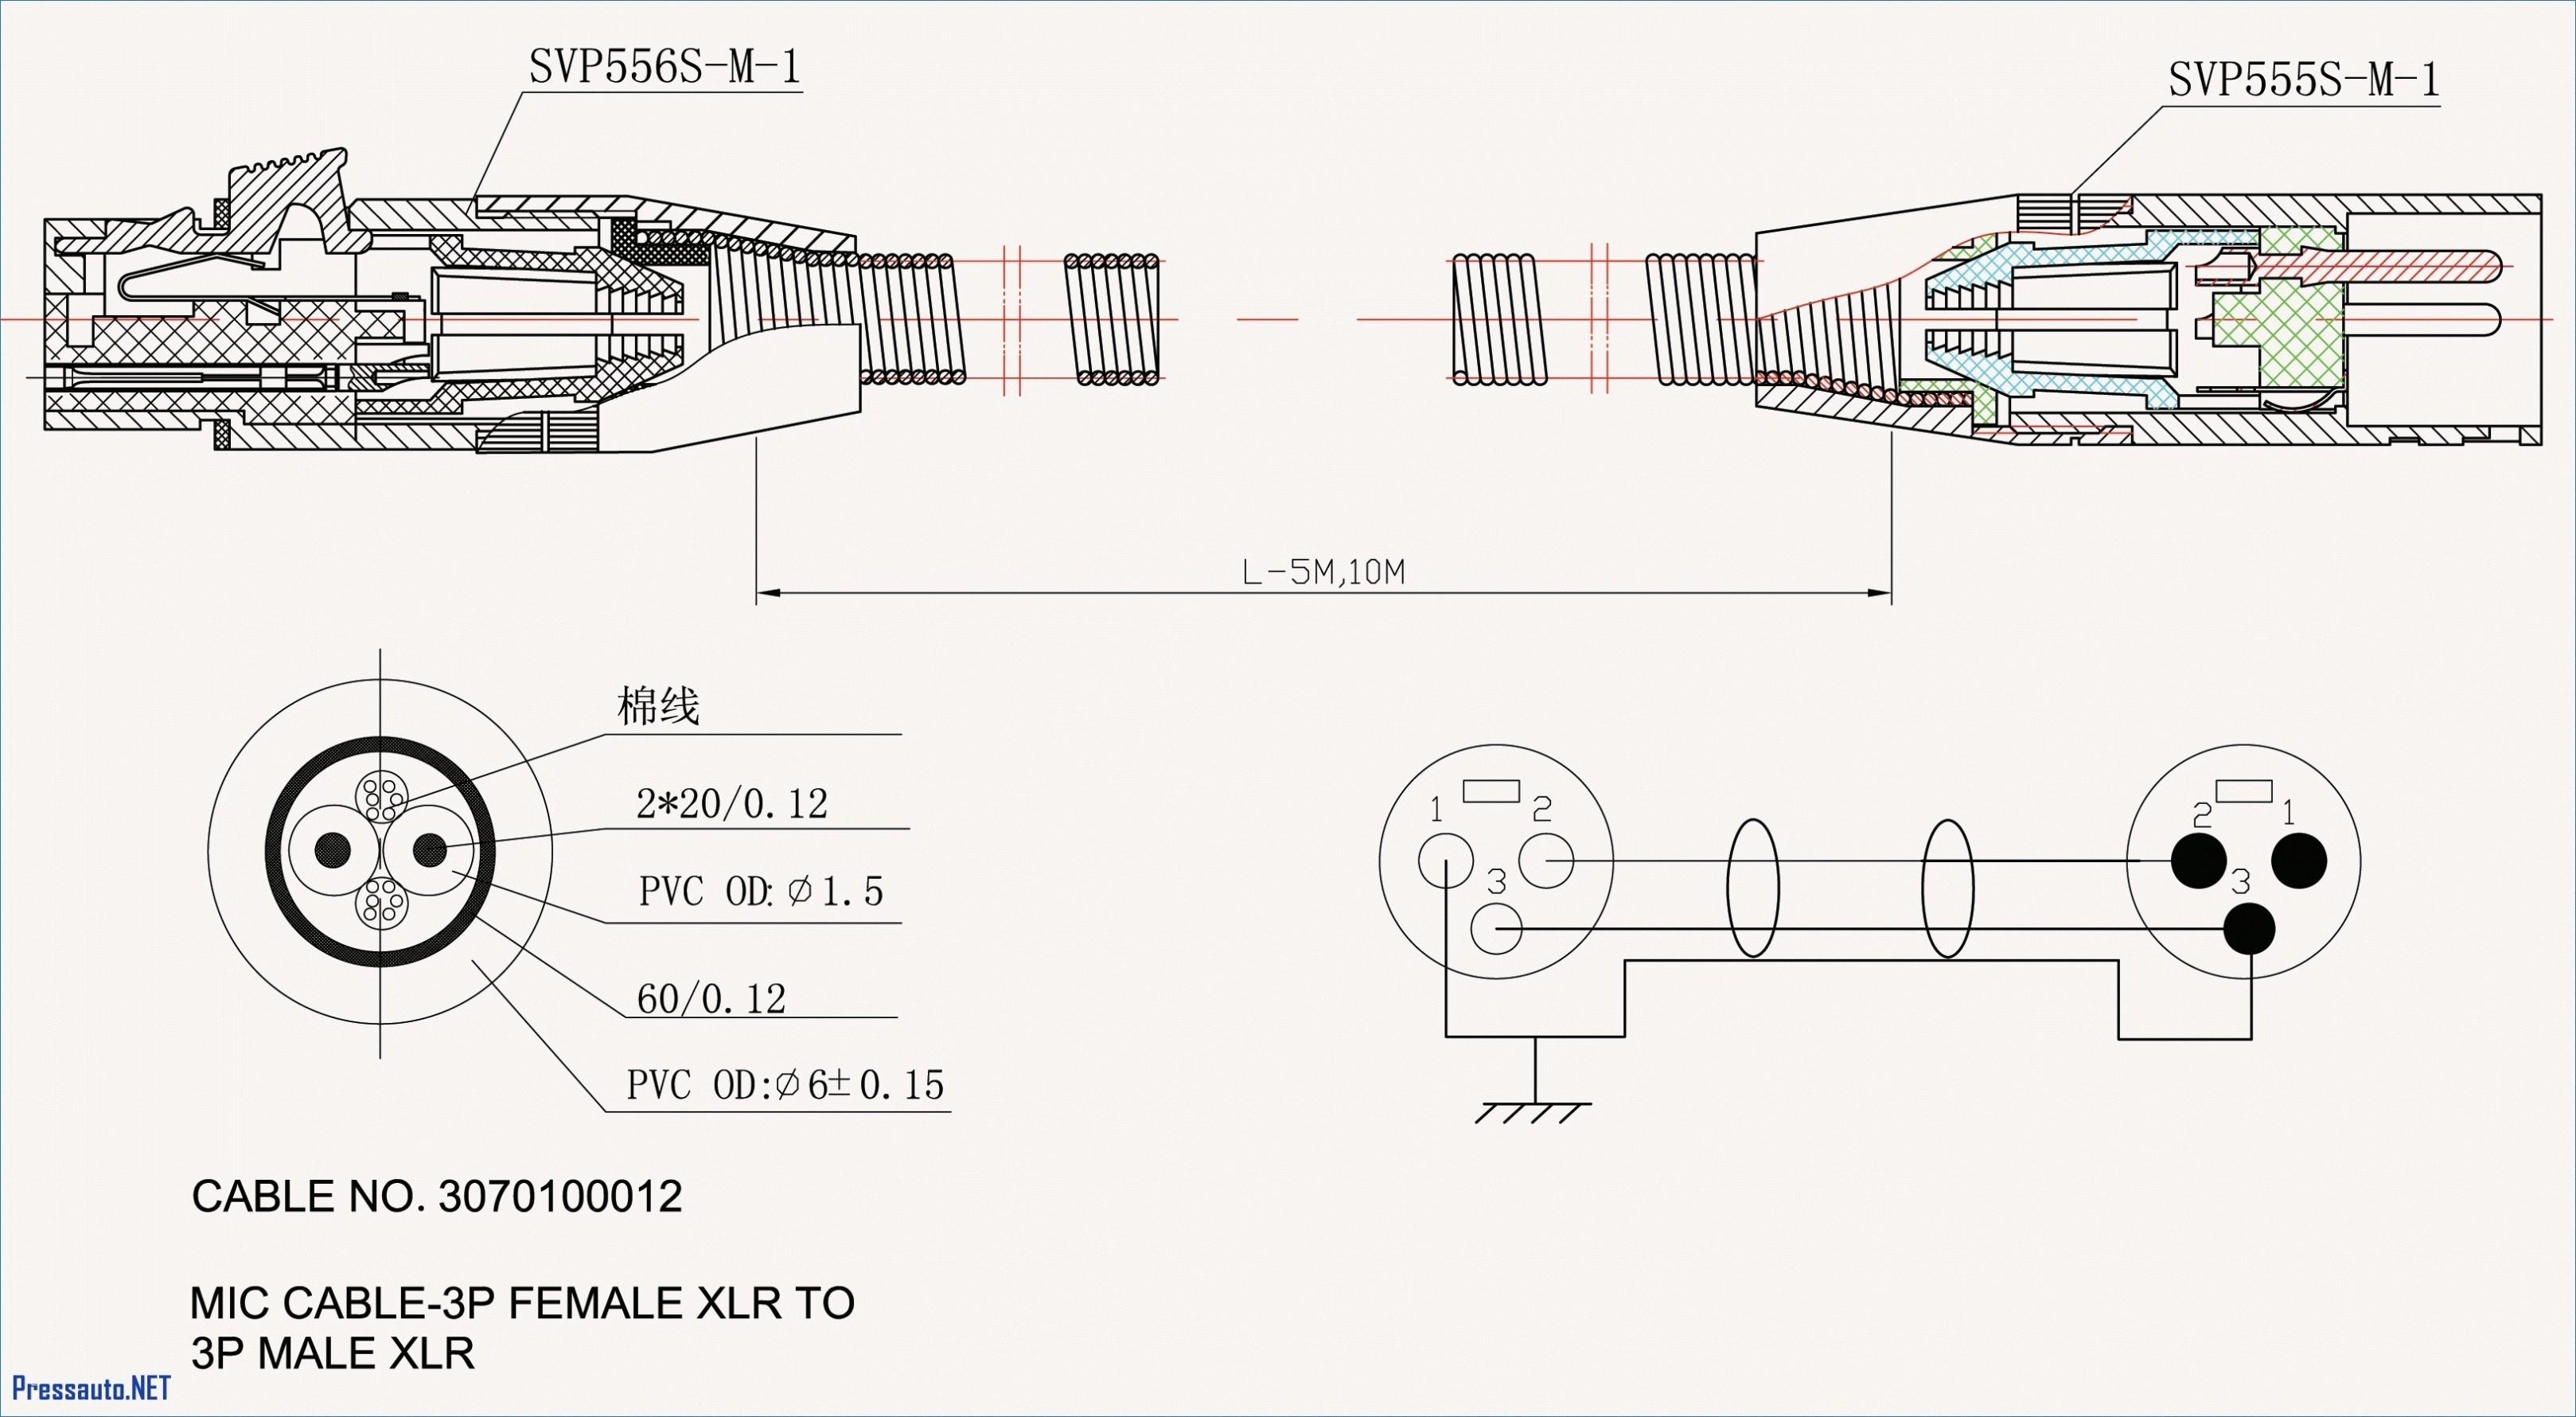 30 Amp Rv Male Plug Wiring Diagram - Wiring Diagram